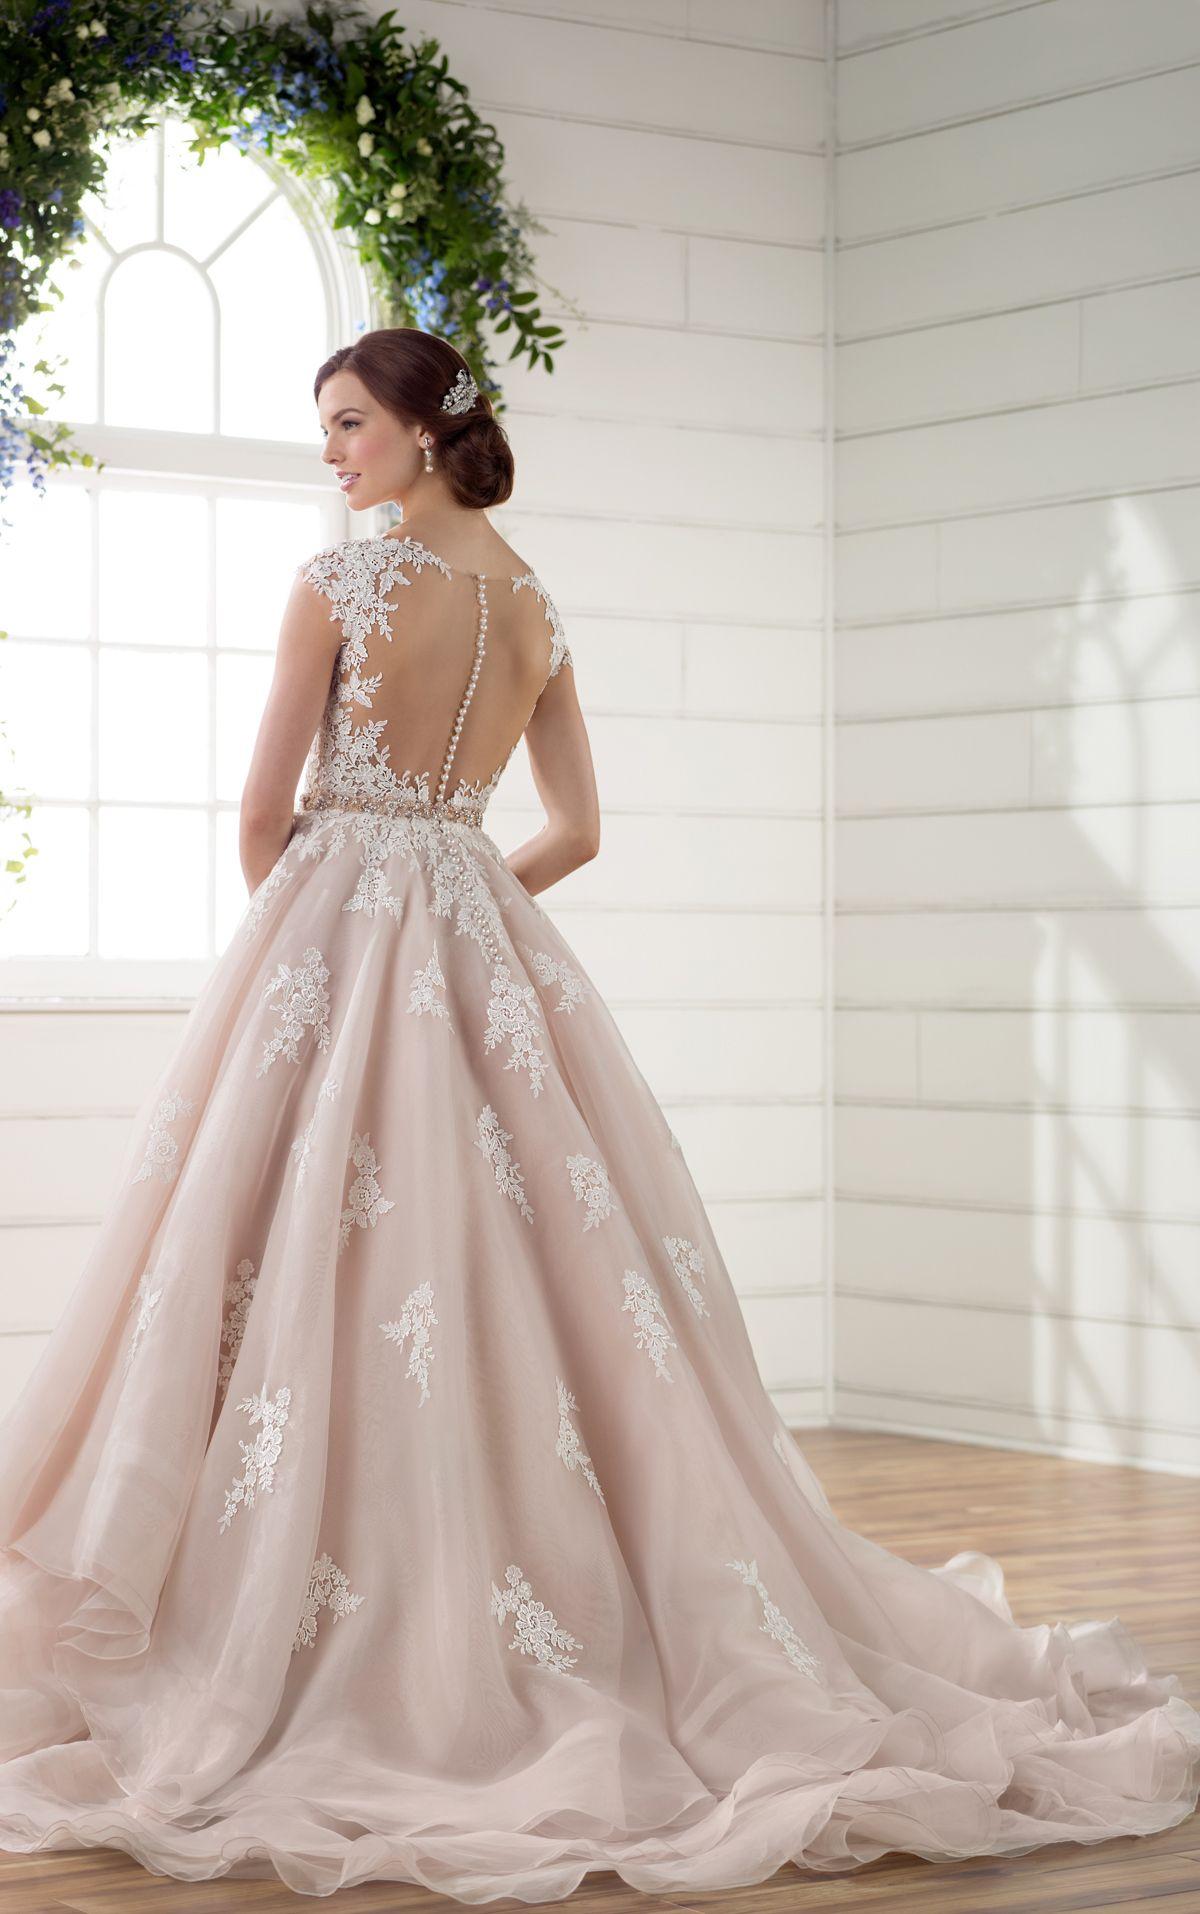 antique lace wedding dress with keyhole back | antique lace, lace